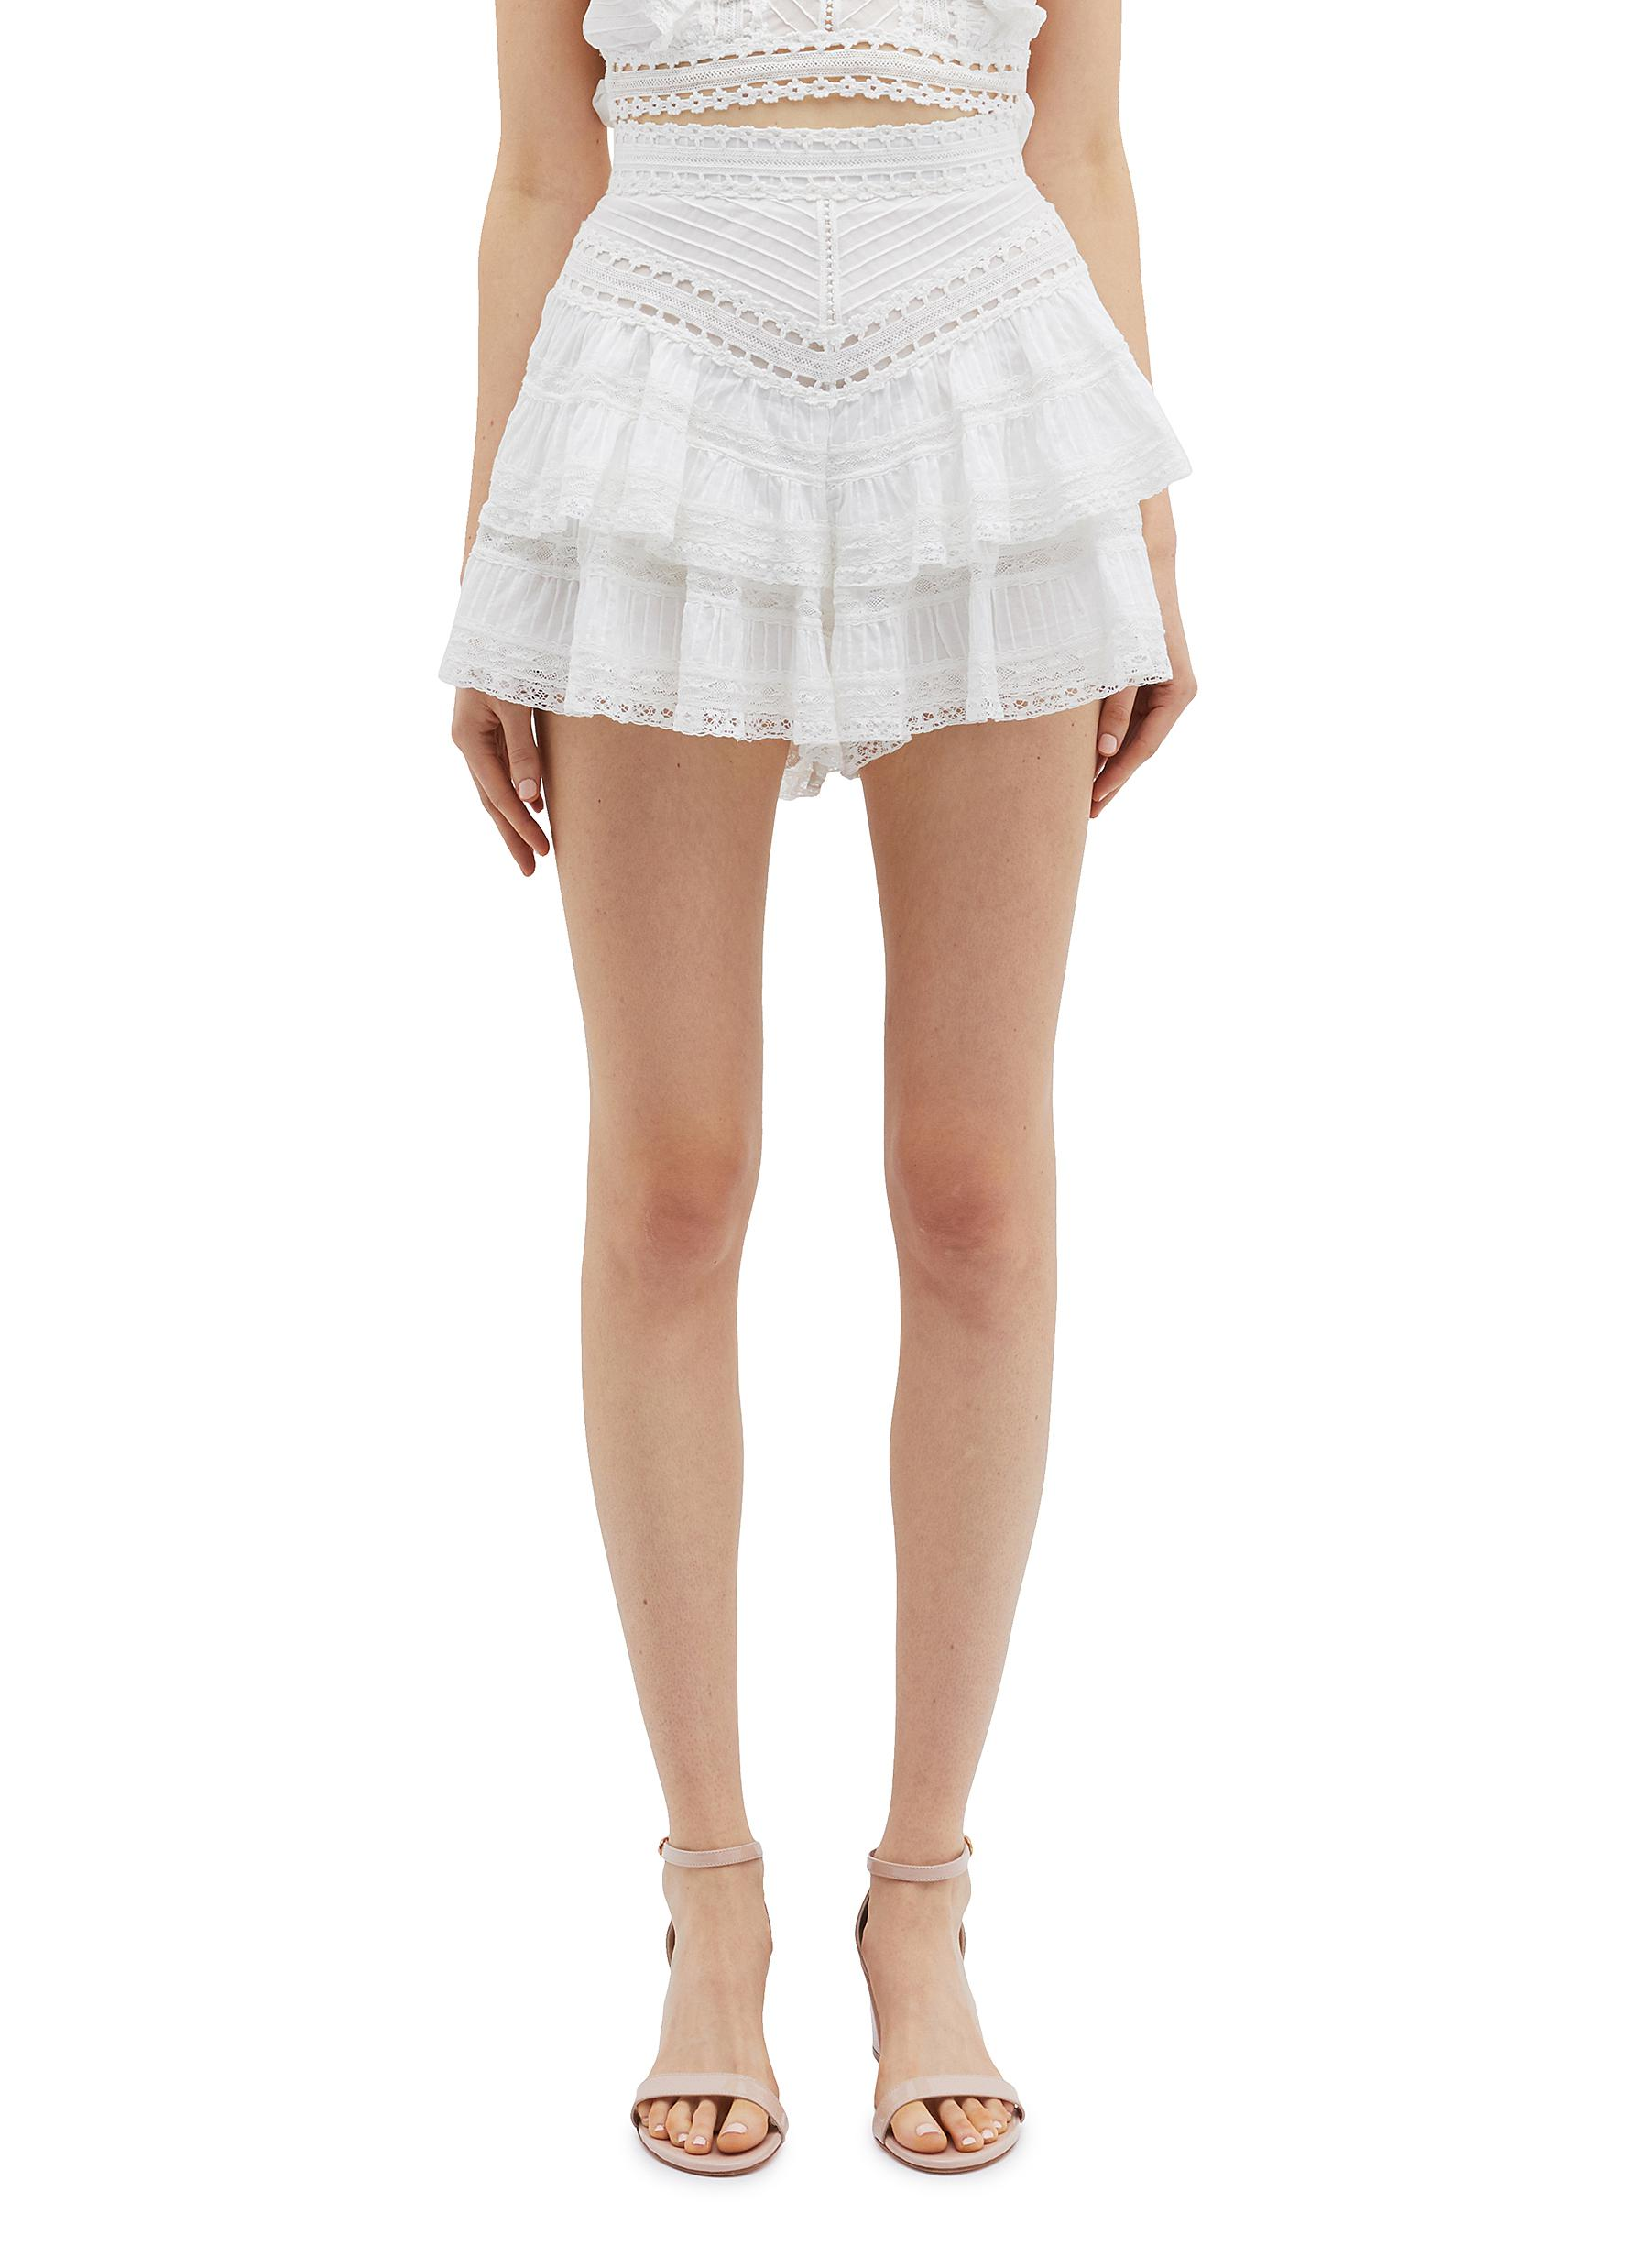 Heathers tiered ruffle lace shorts by Zimmermann